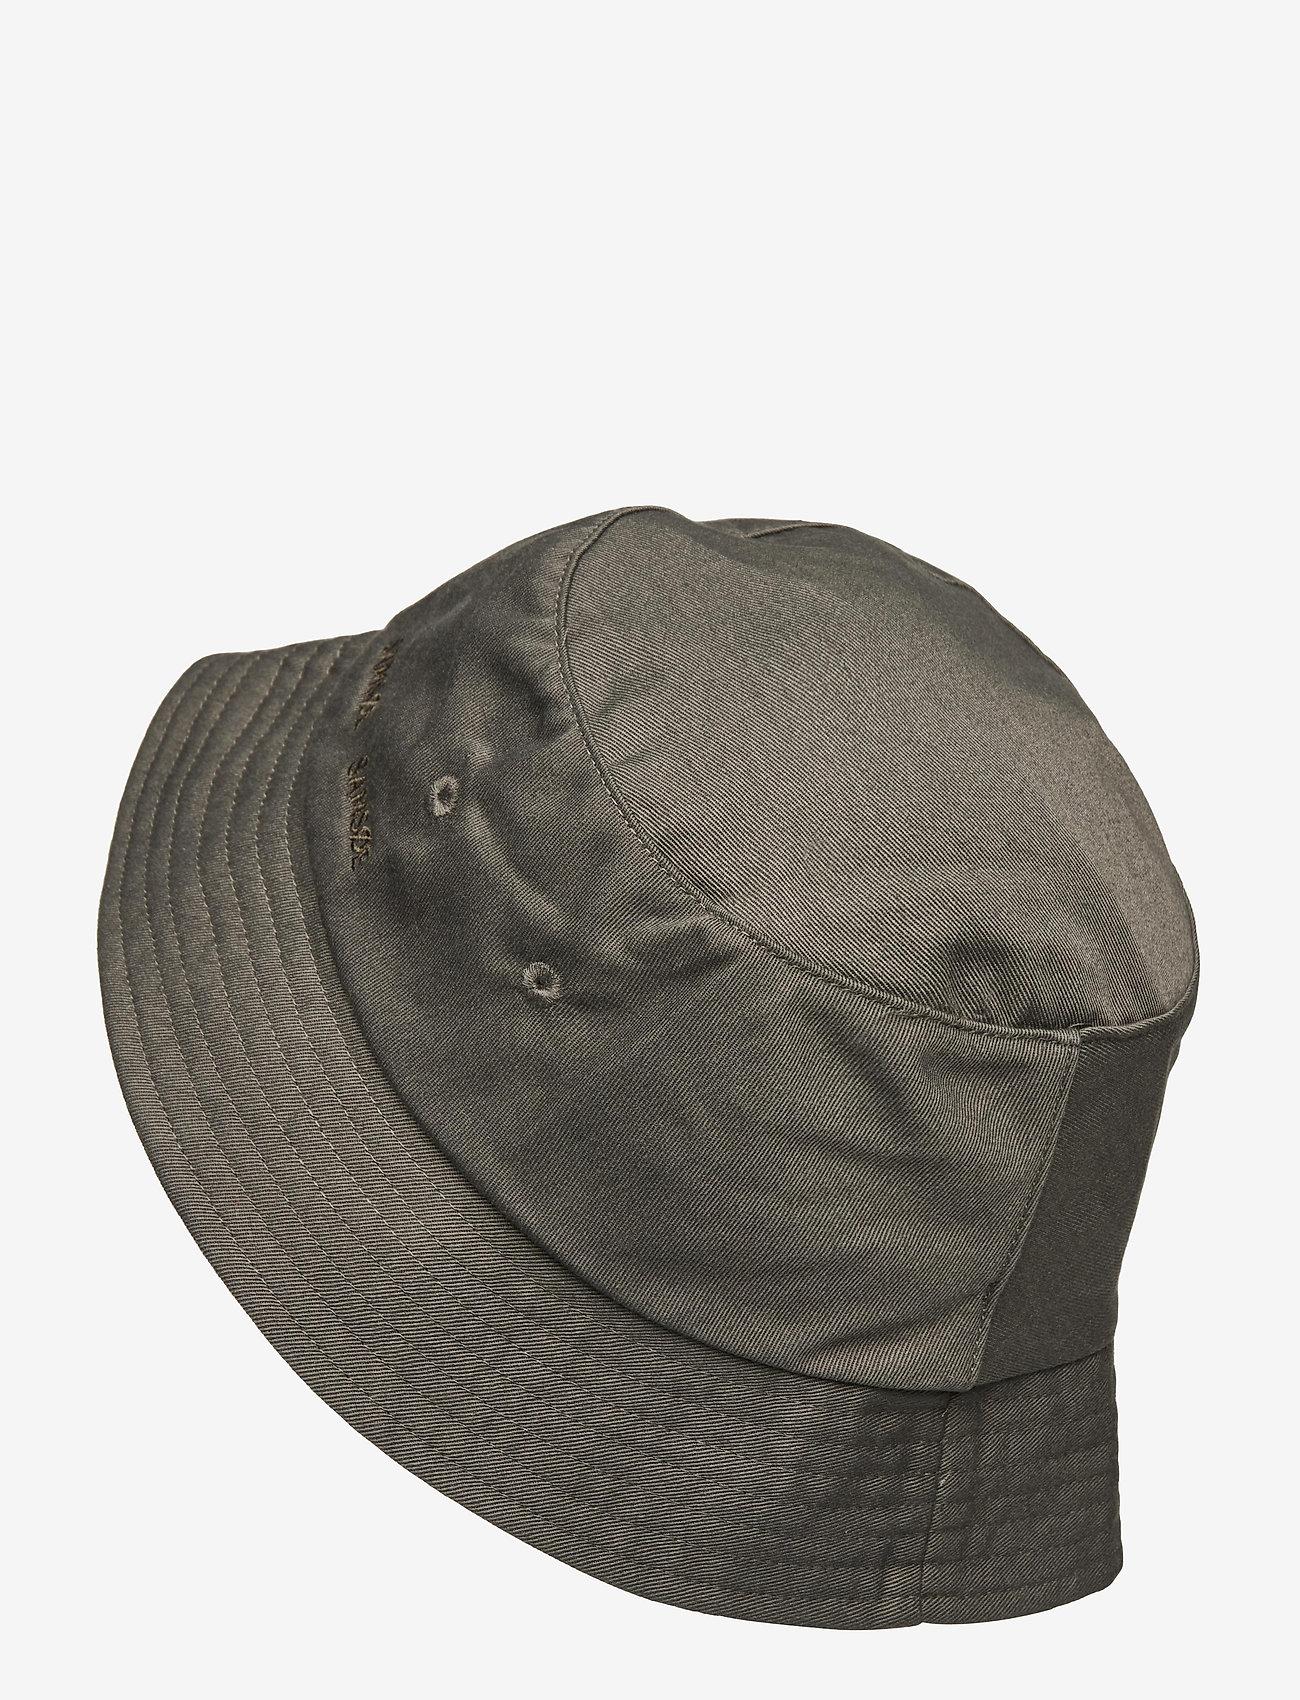 Samsøe Samsøe - Anton bucket hat 14061 - bonnets & casquettes - kambu green - 1